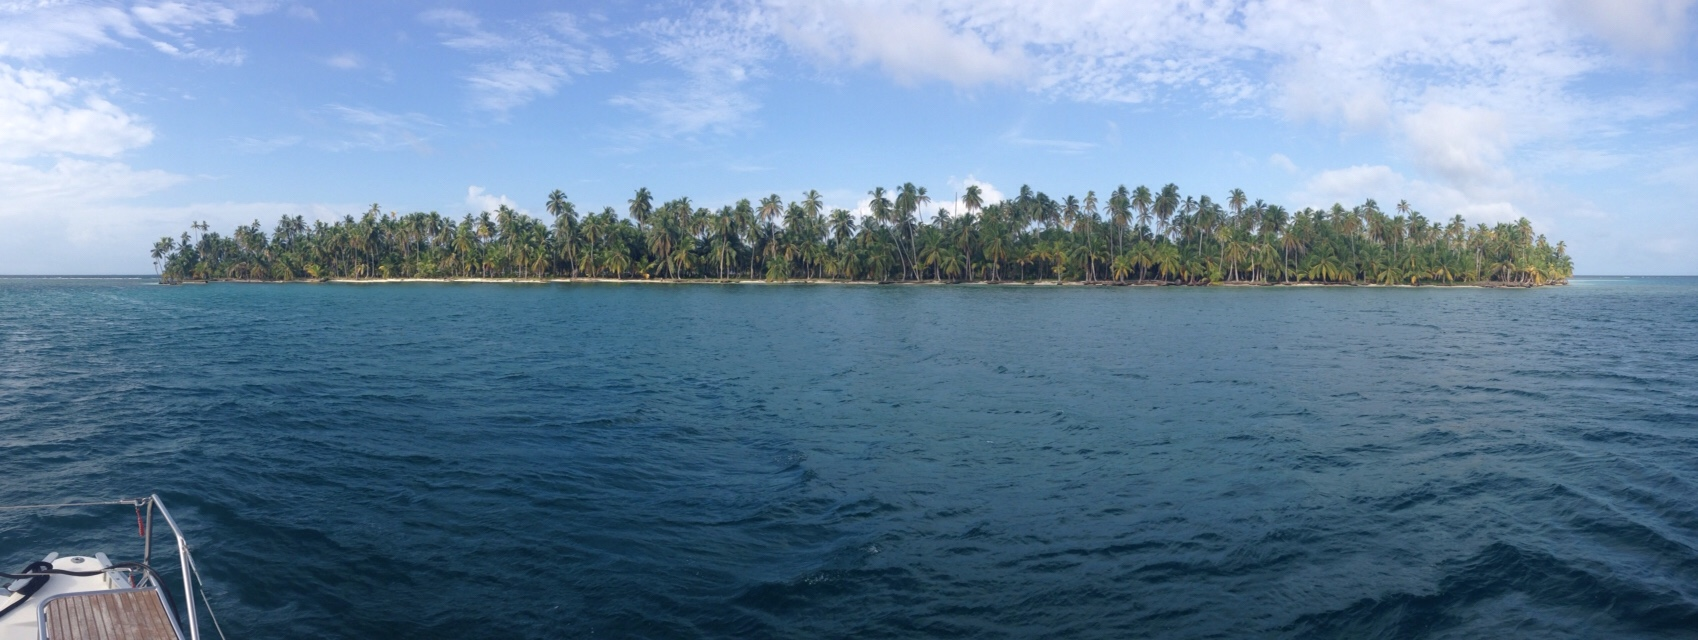 Approaching Green Island